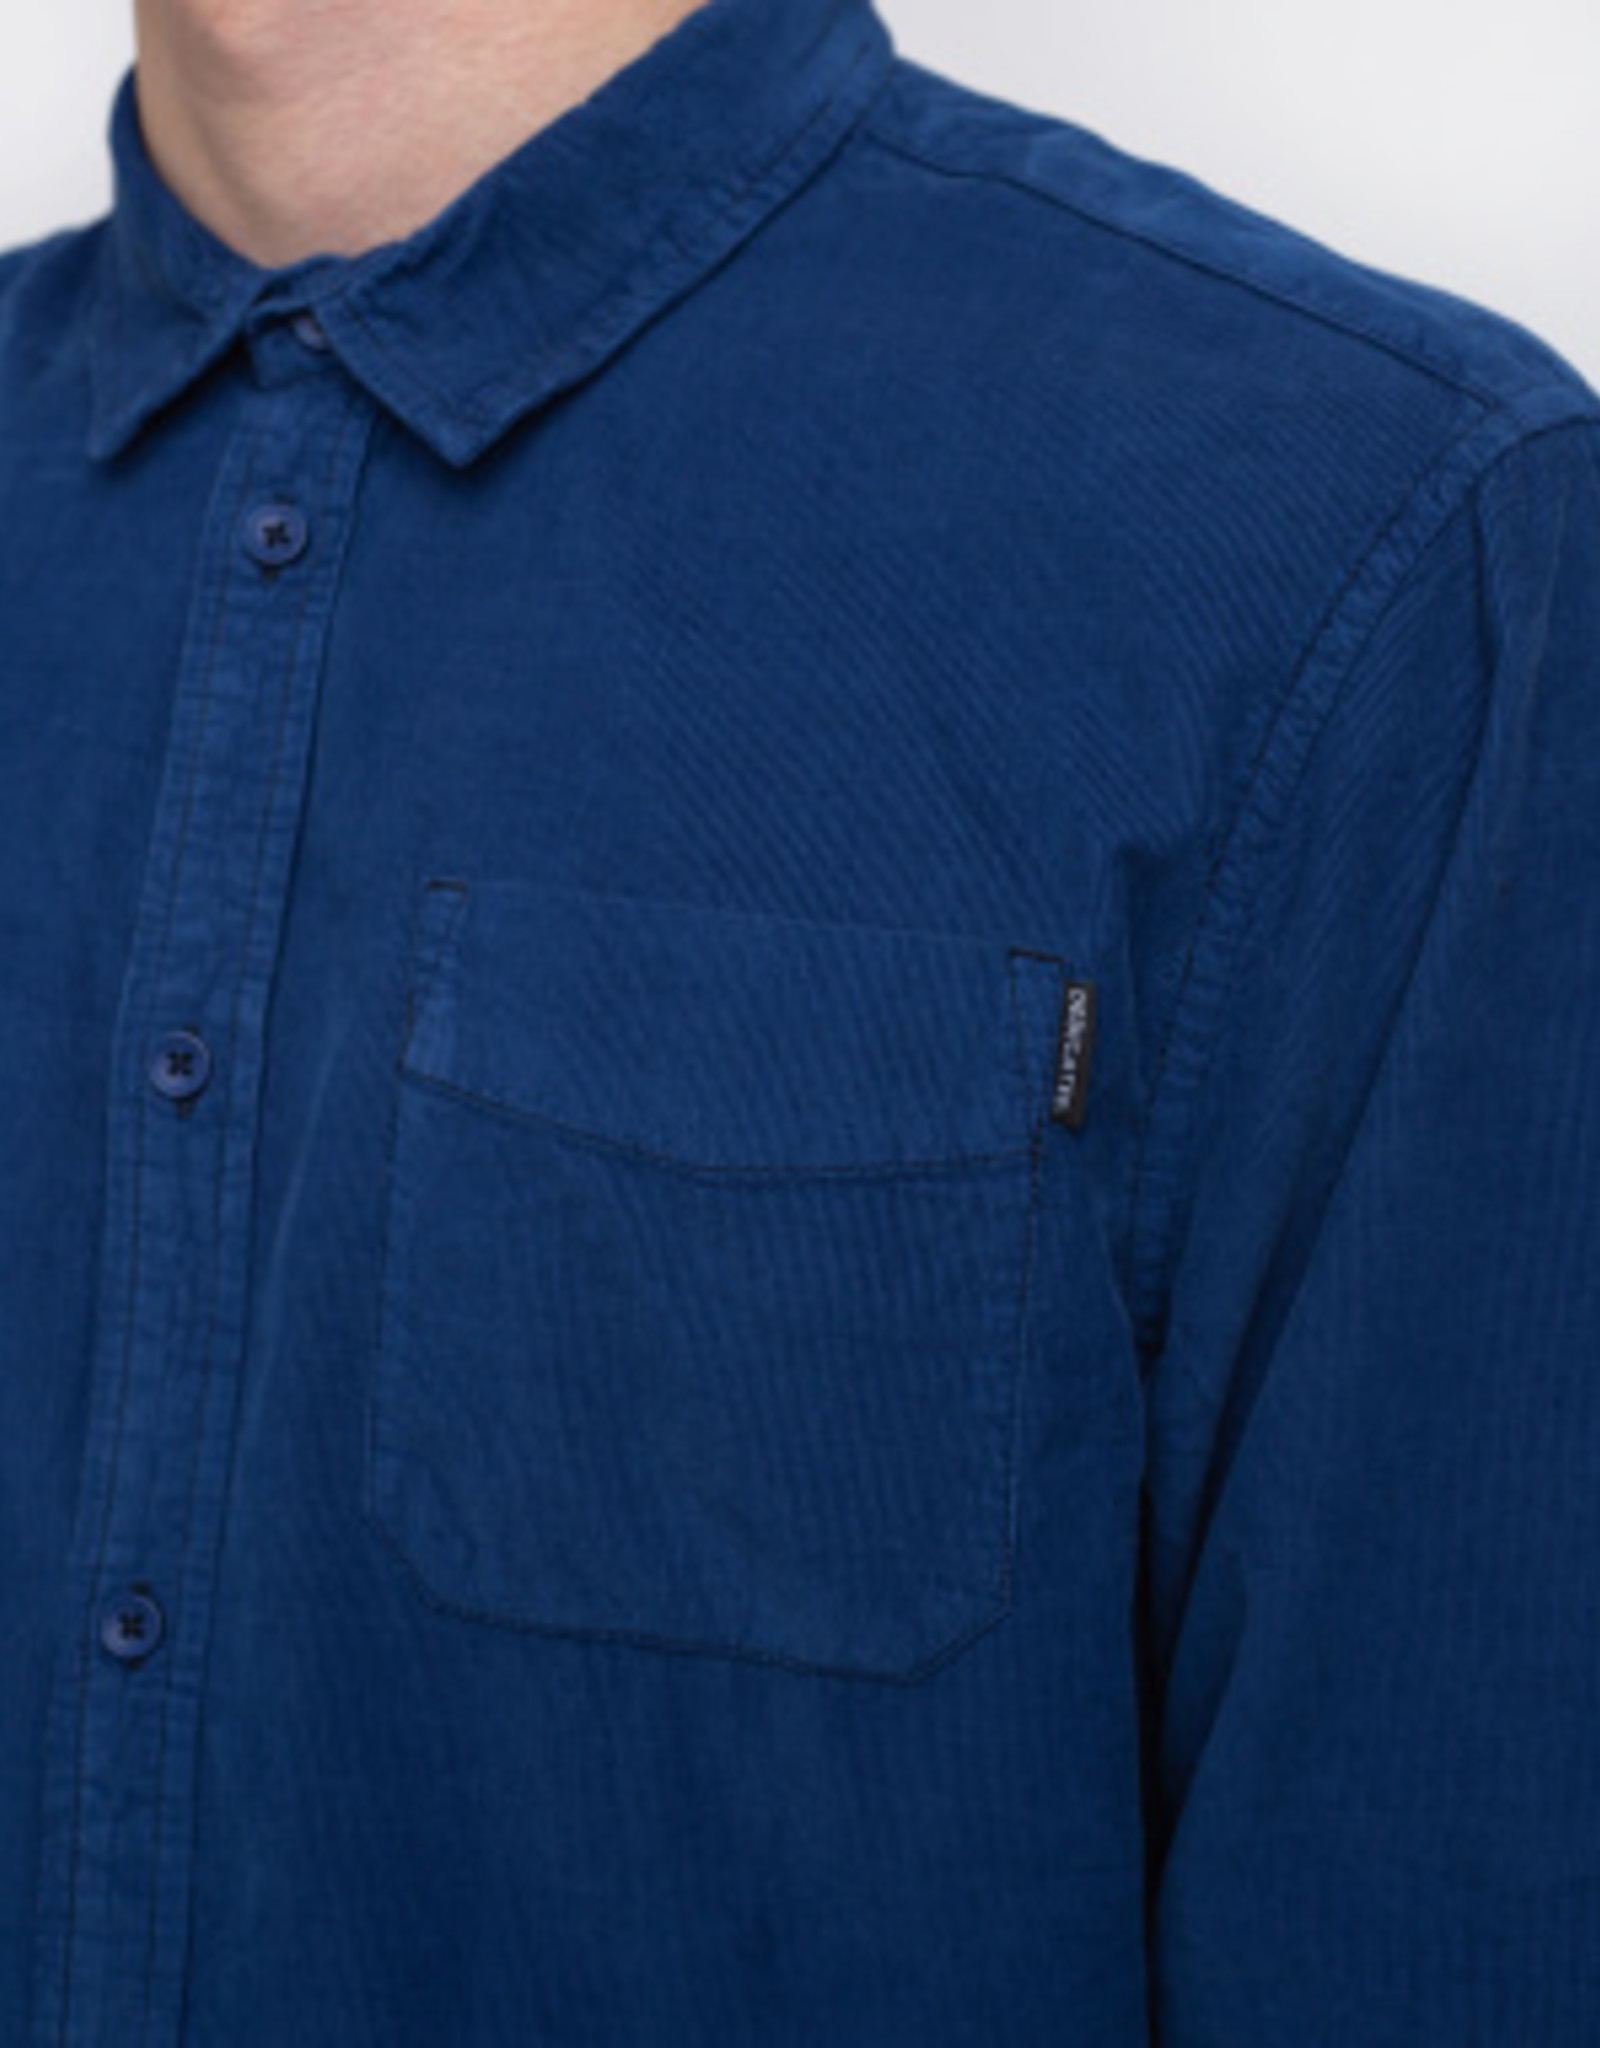 Dedicated HEMD CORDUROY BLUE